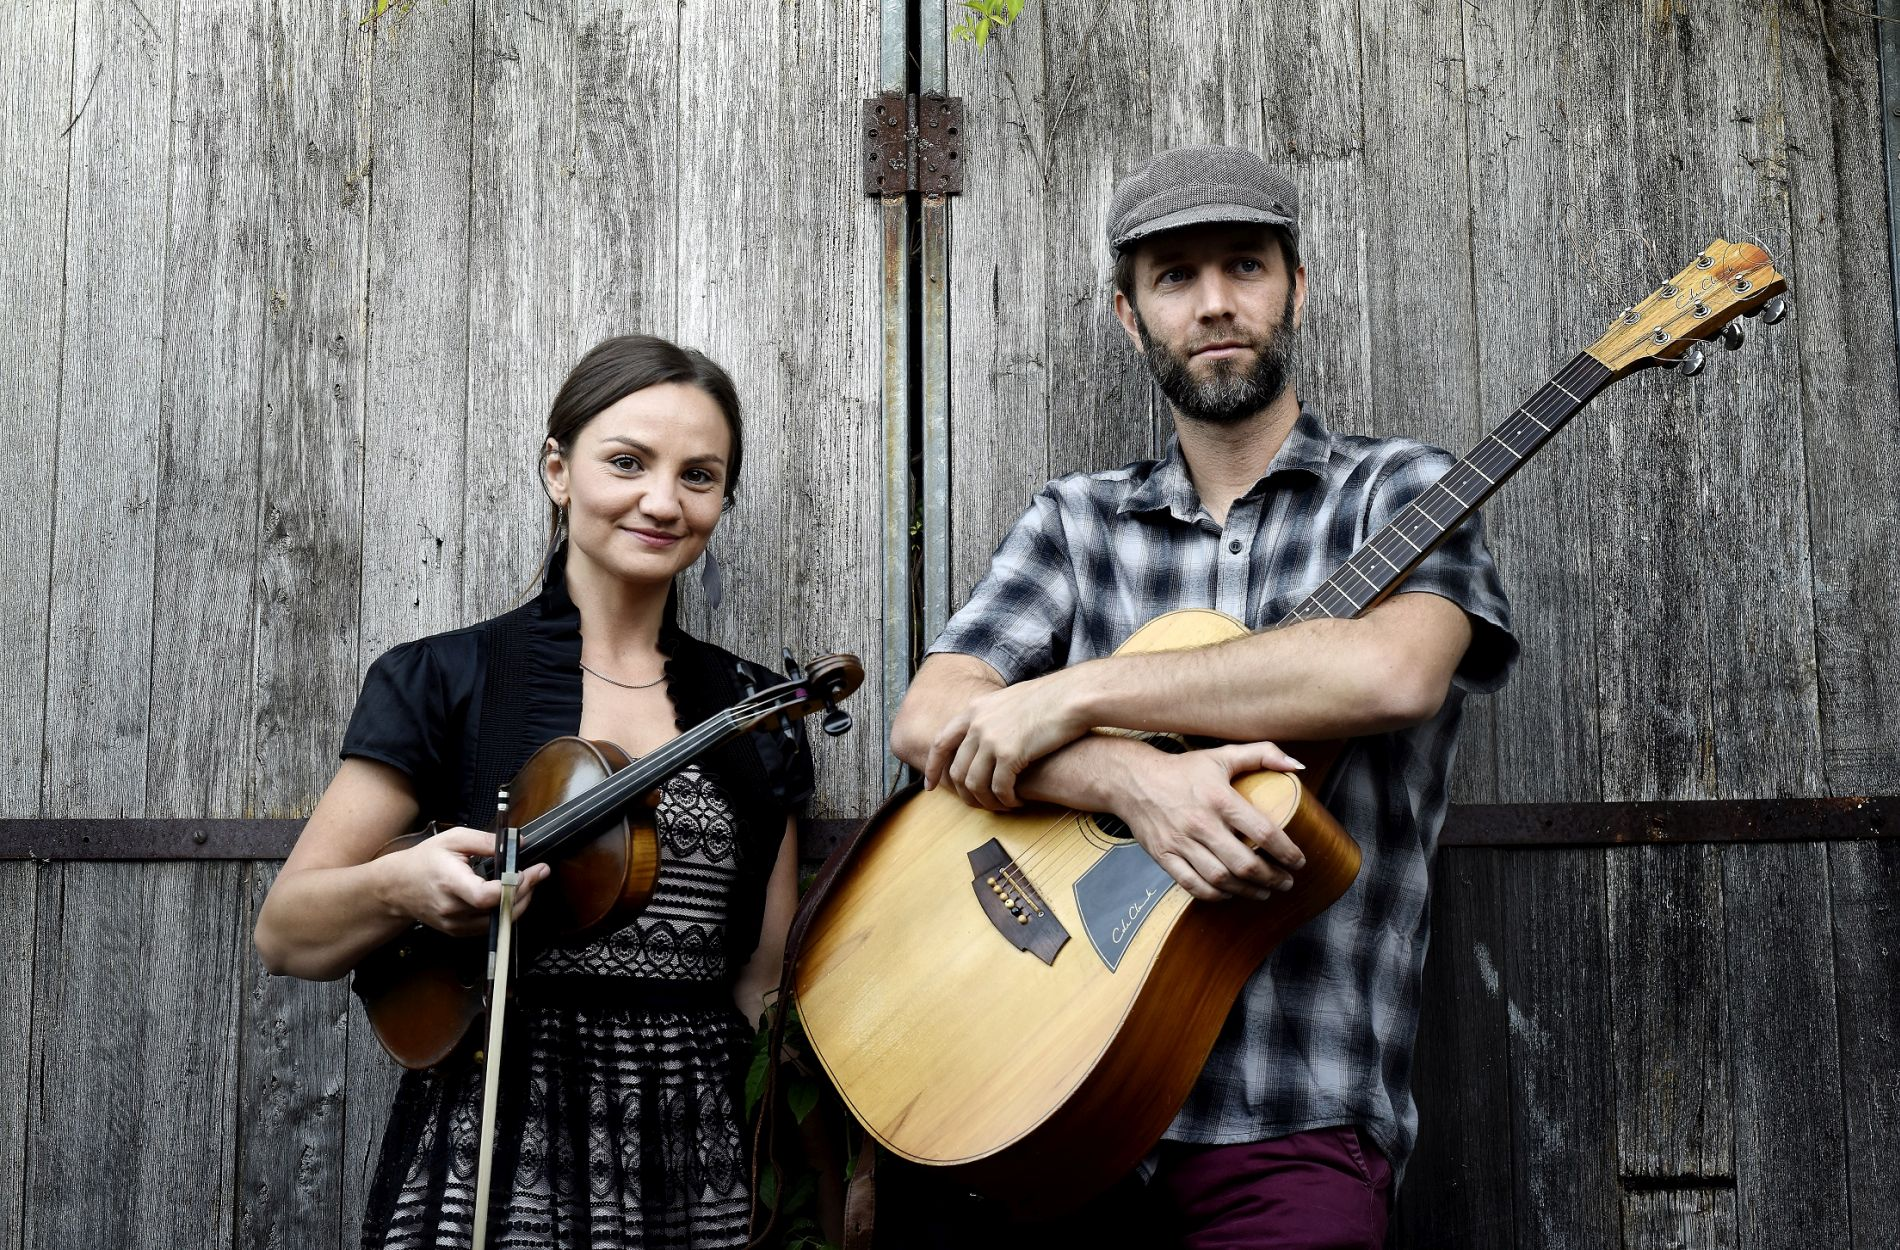 Tim McMillan & Rachel Snow (źródło: materiały prasowe organizatora)